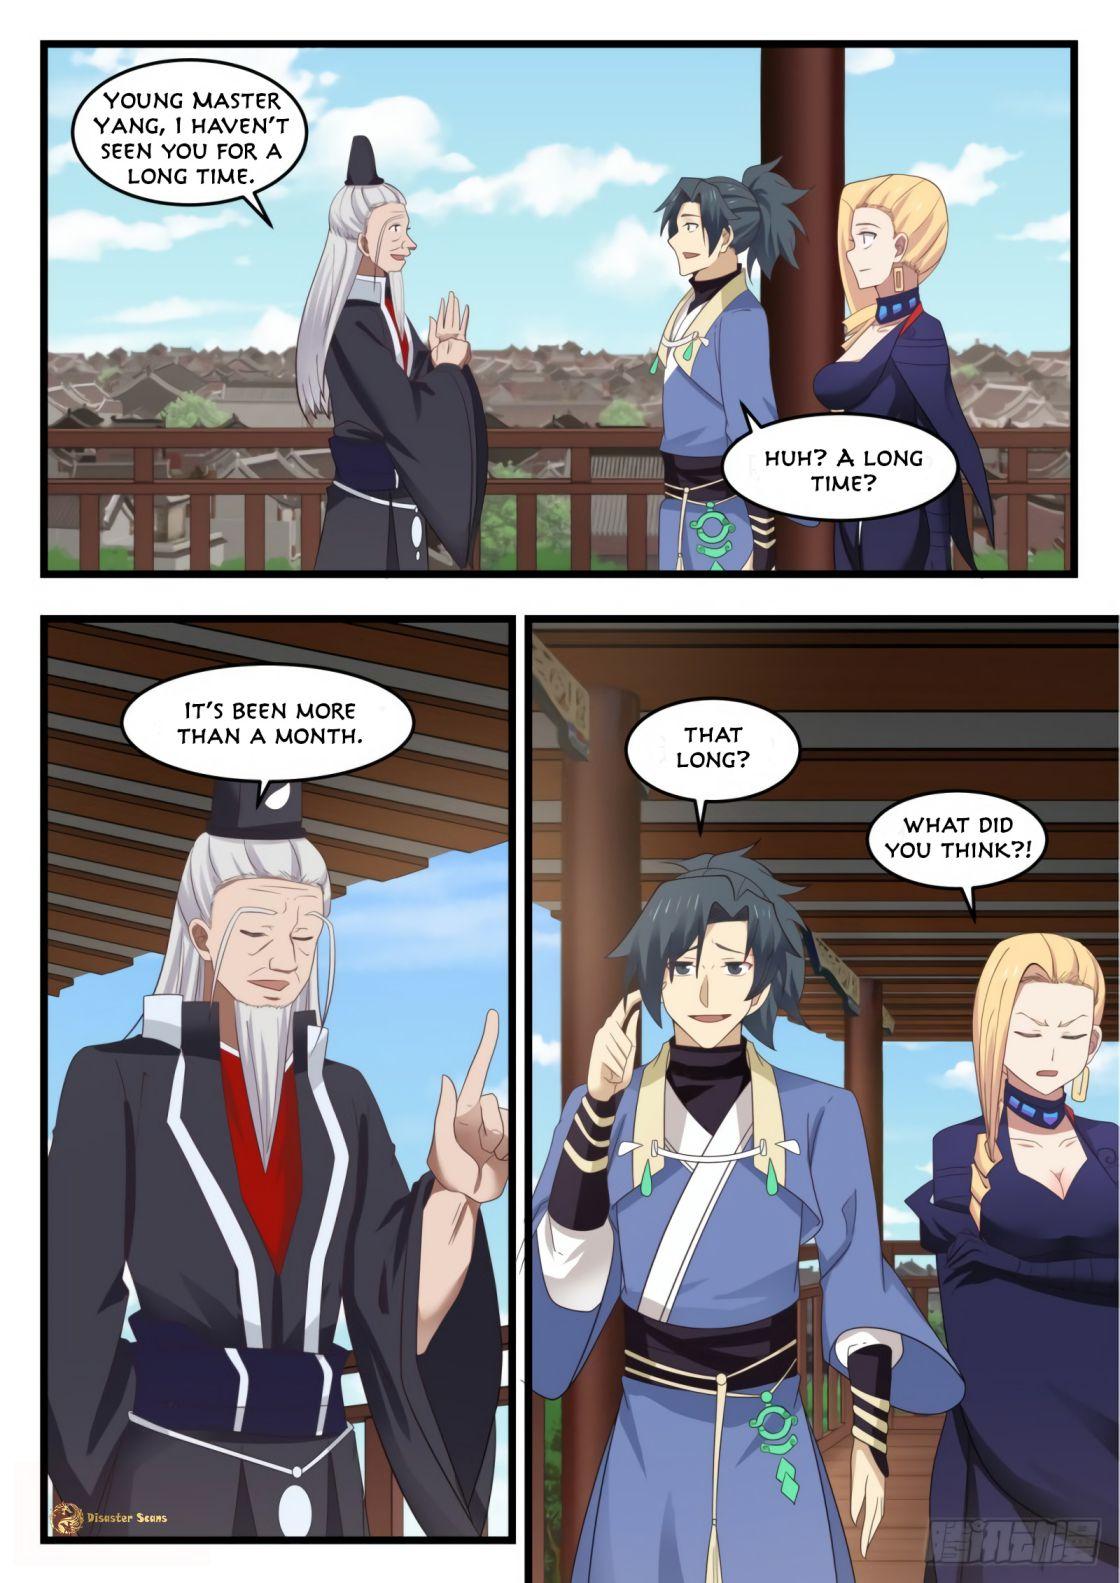 Martial Peak - chapter 534-eng-li